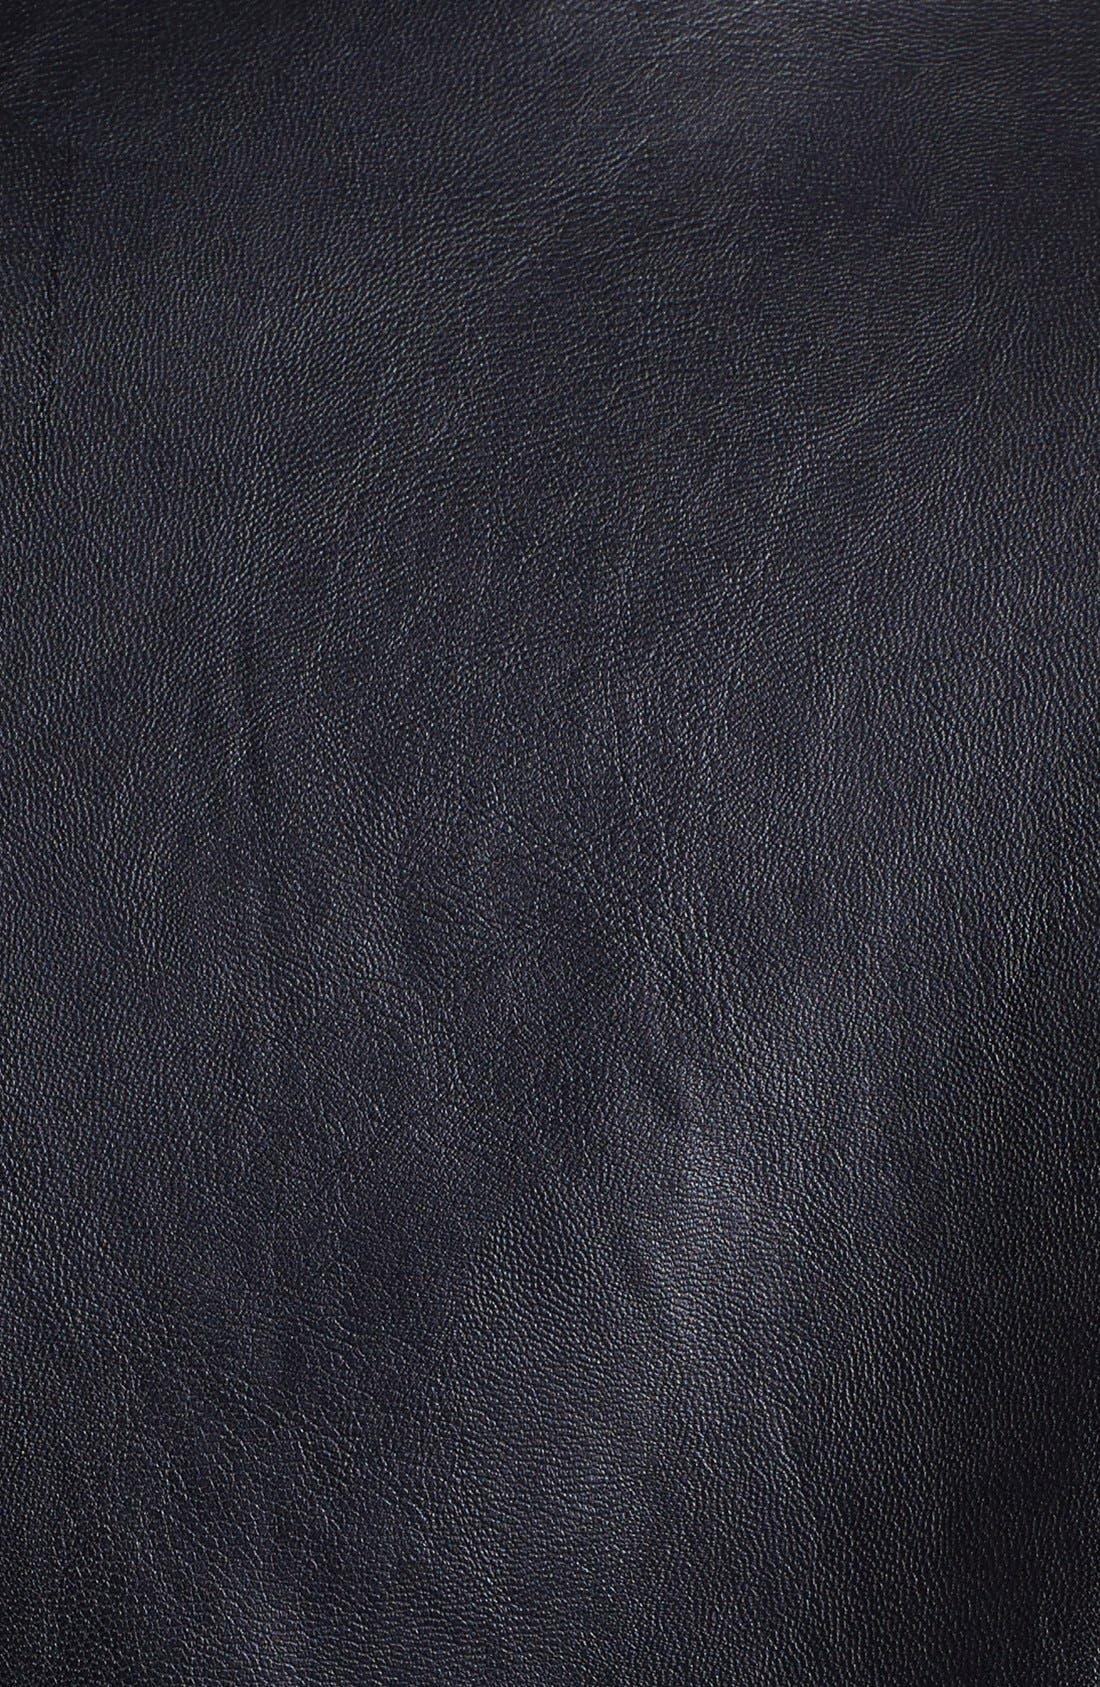 Alternate Image 3  - Mural Faux Leather Moto Jacket